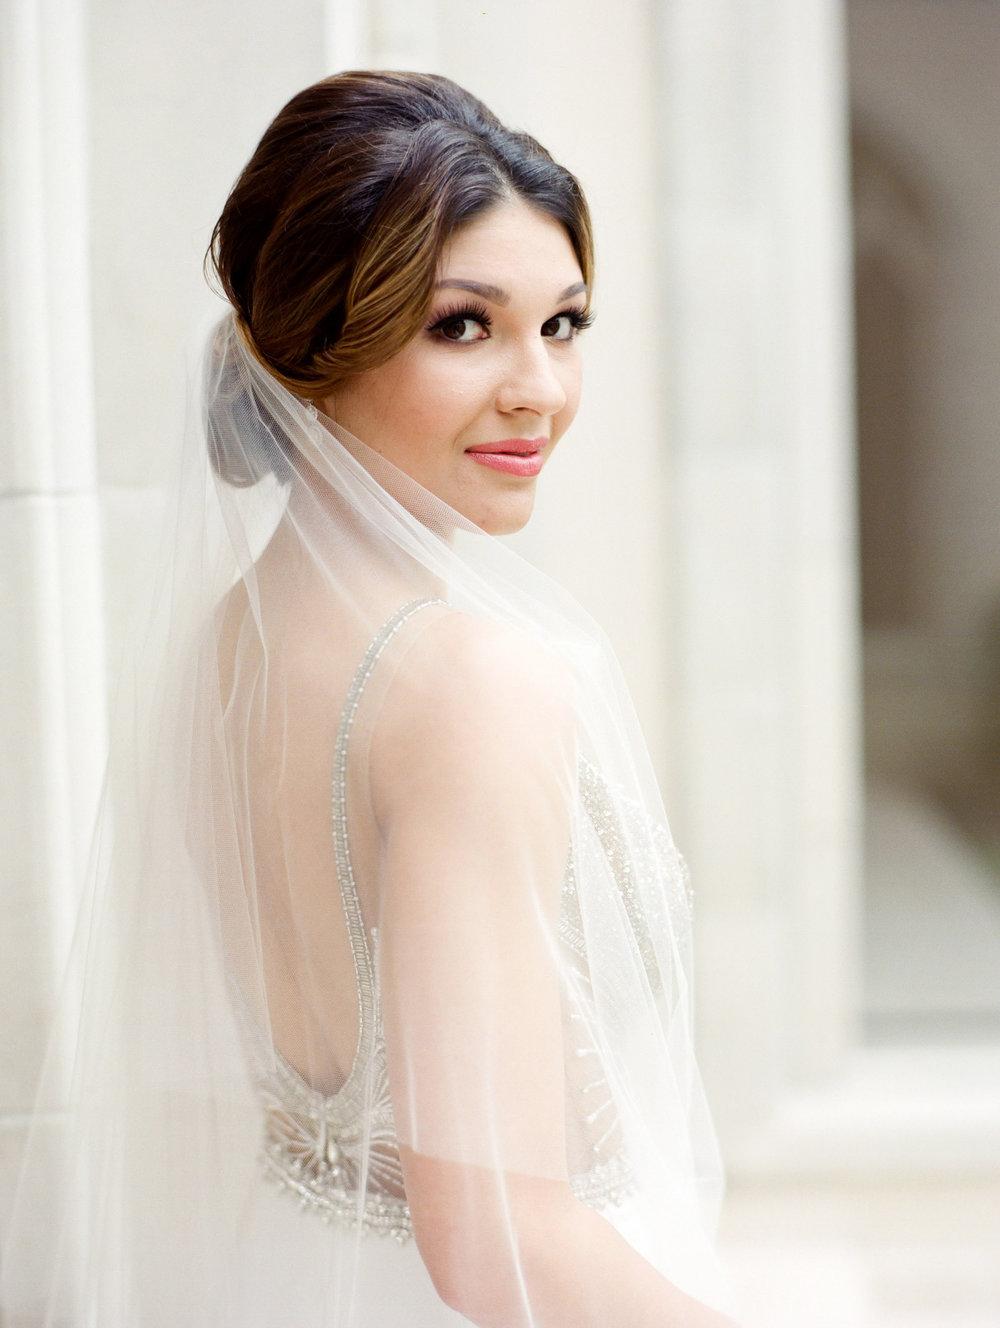 0026_0021_Houston-Chateau-Cocomar-Bridal-Portrait.jpg